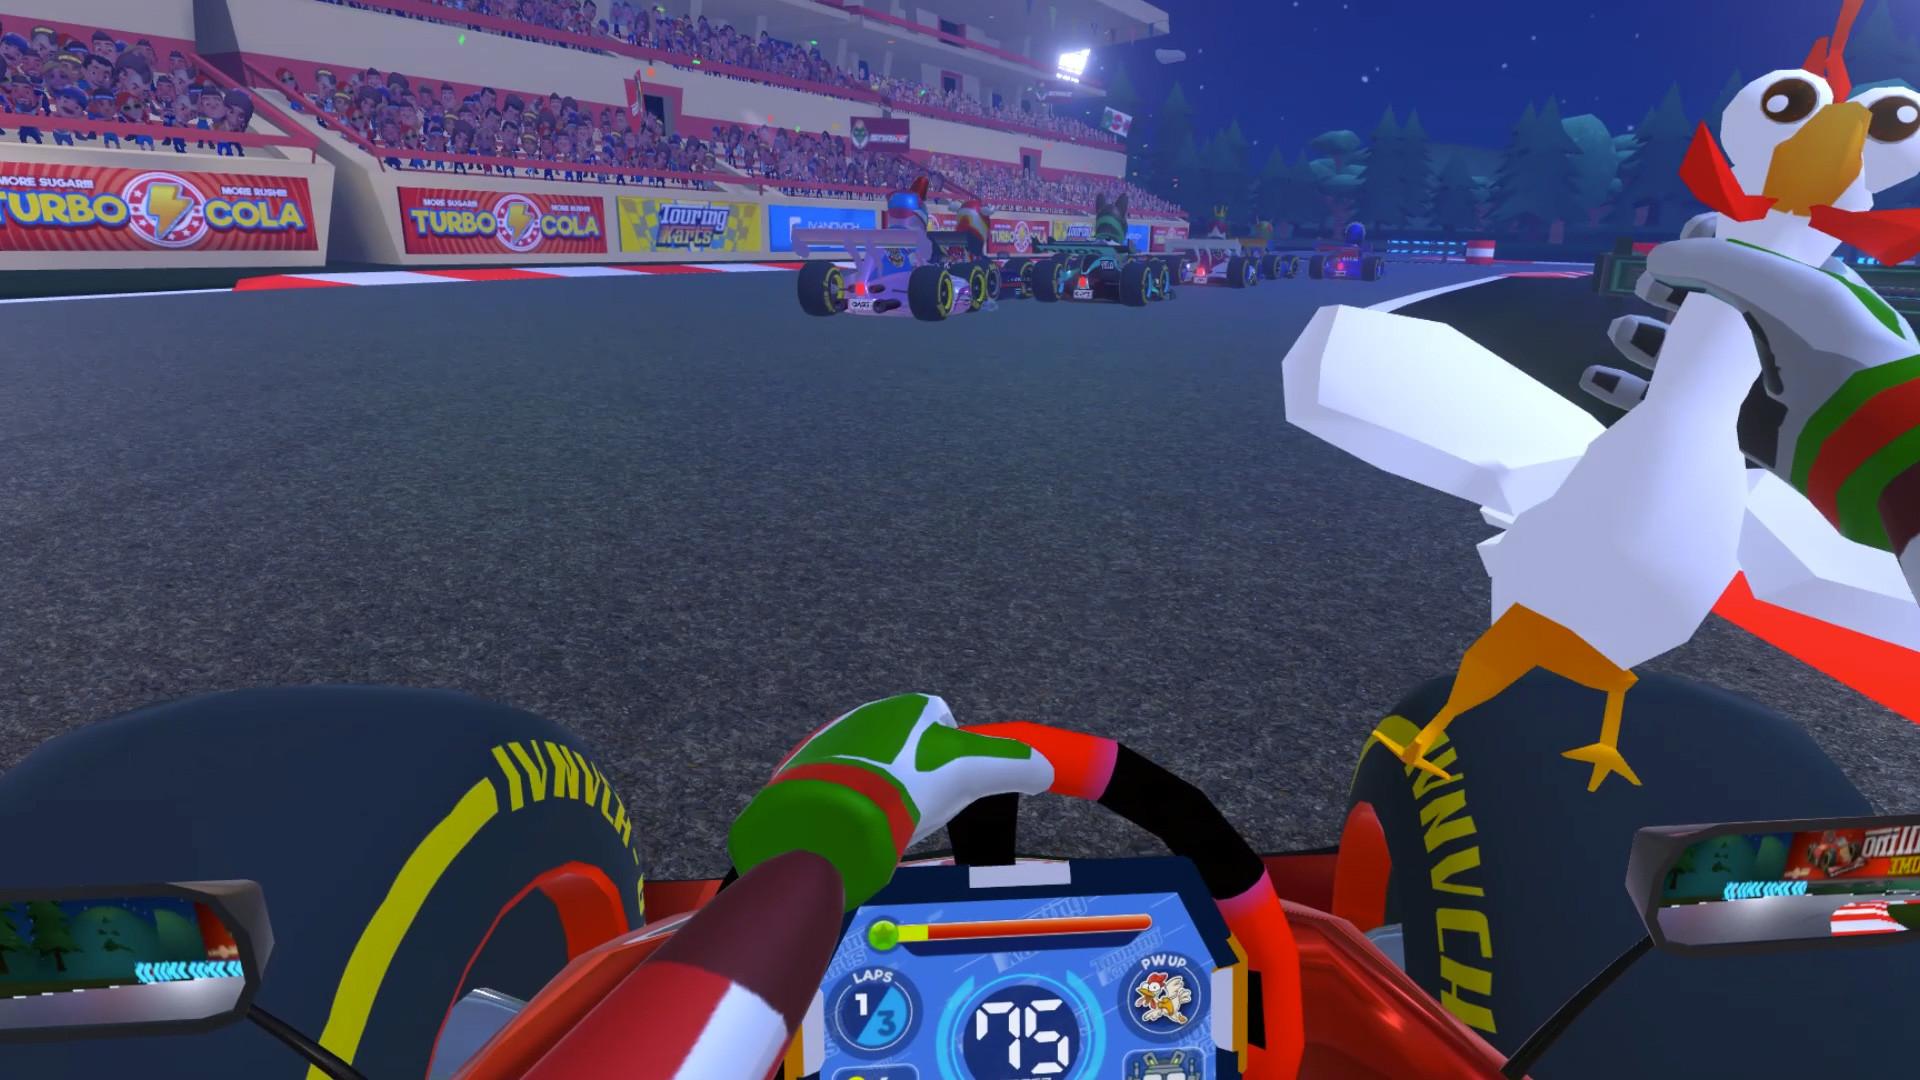 Oculus Quest 游戏《Touring Karts》疯狂卡丁车插图(2)